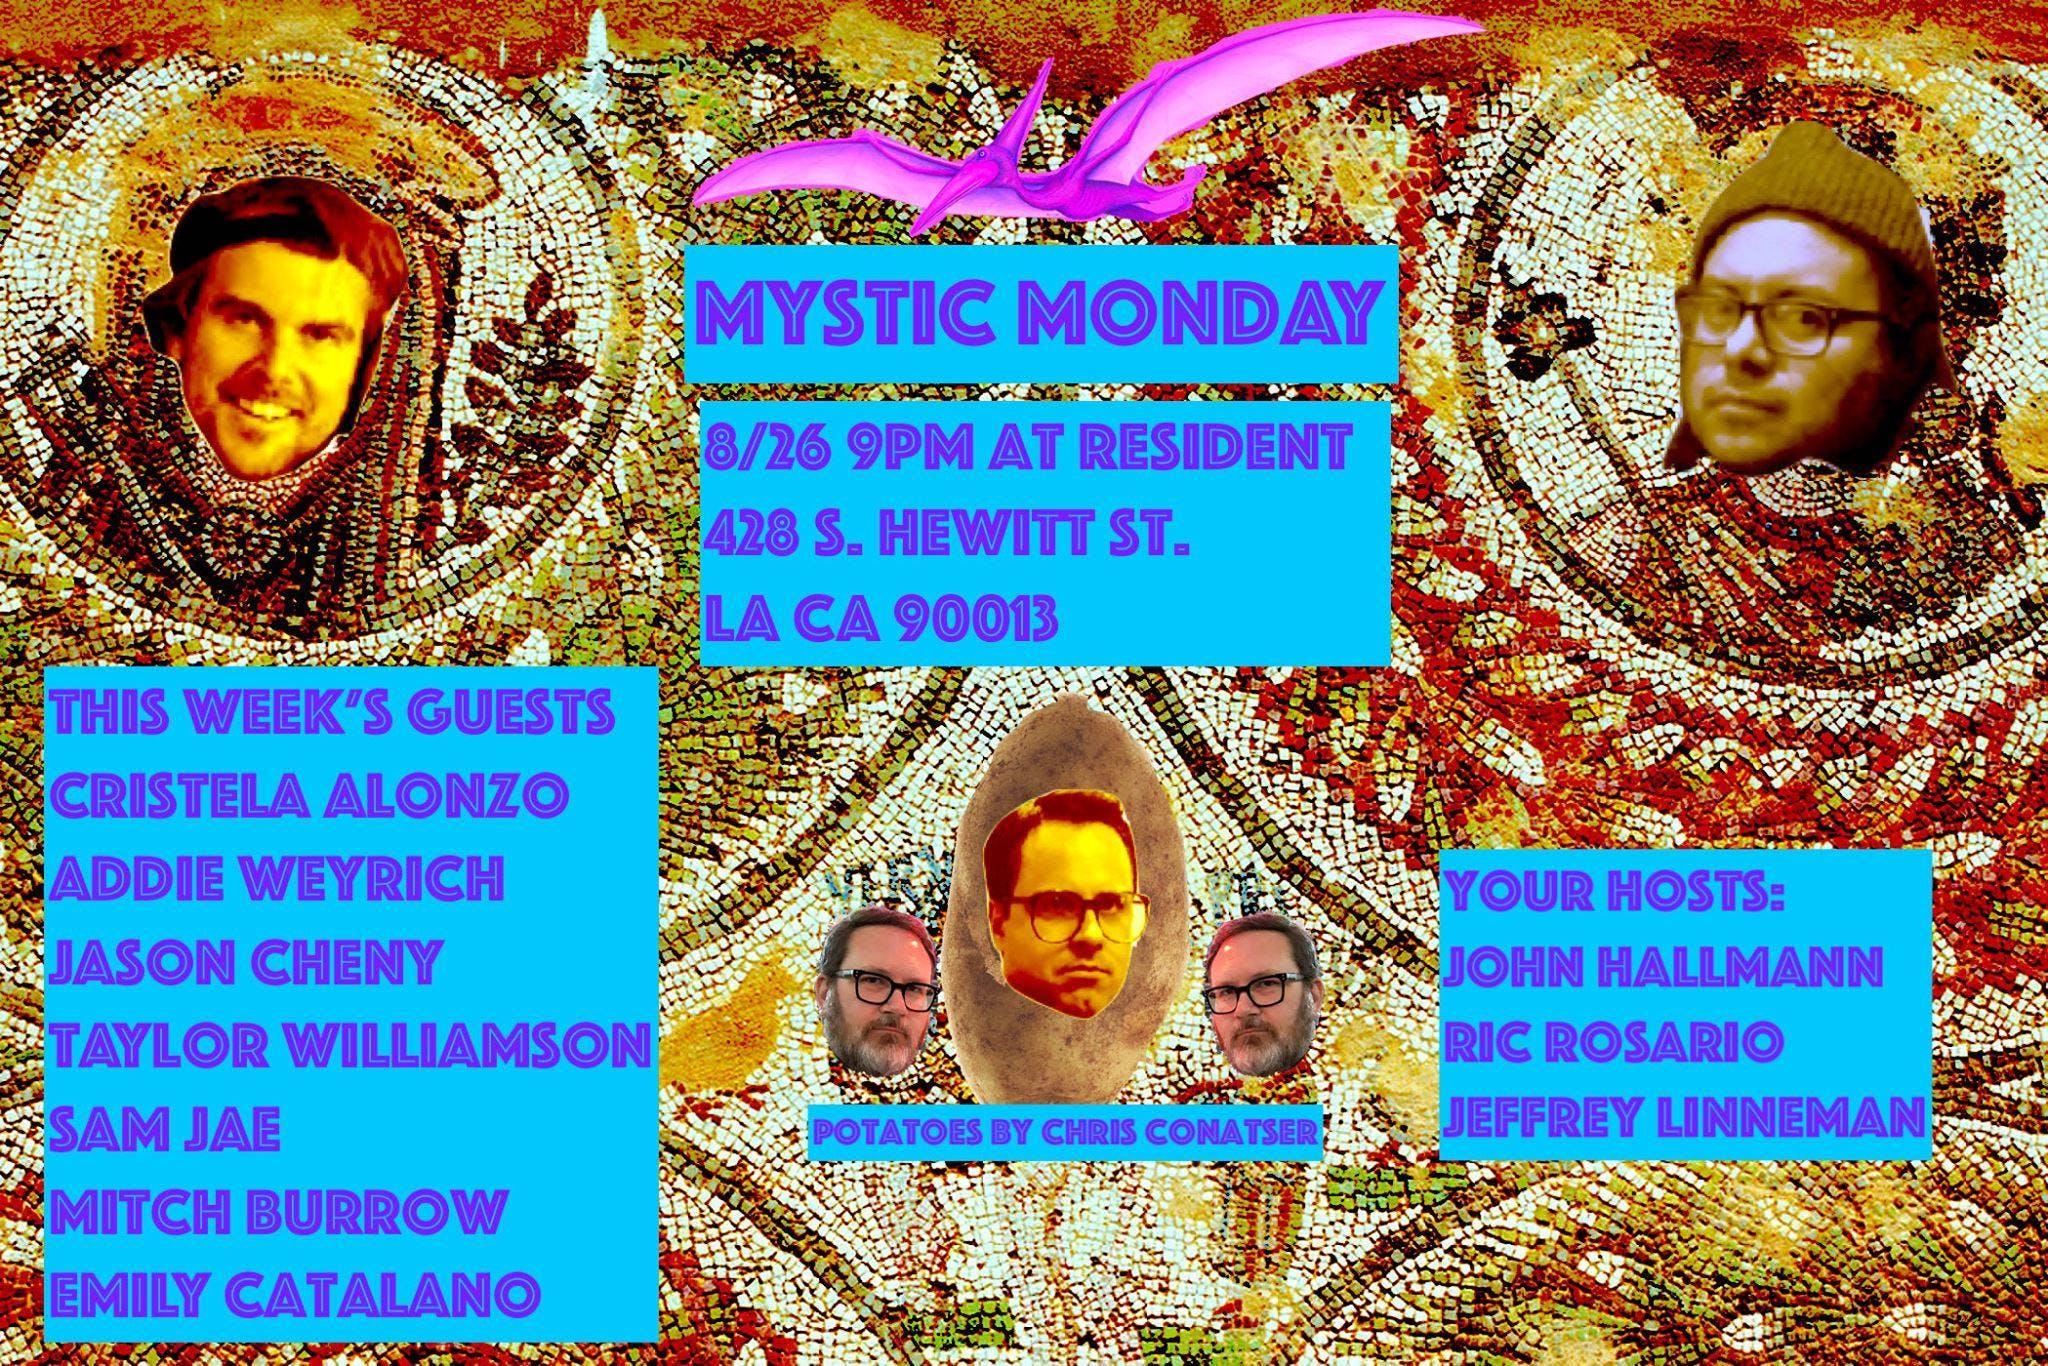 Mystic Monday Comedy Night - No Cover!